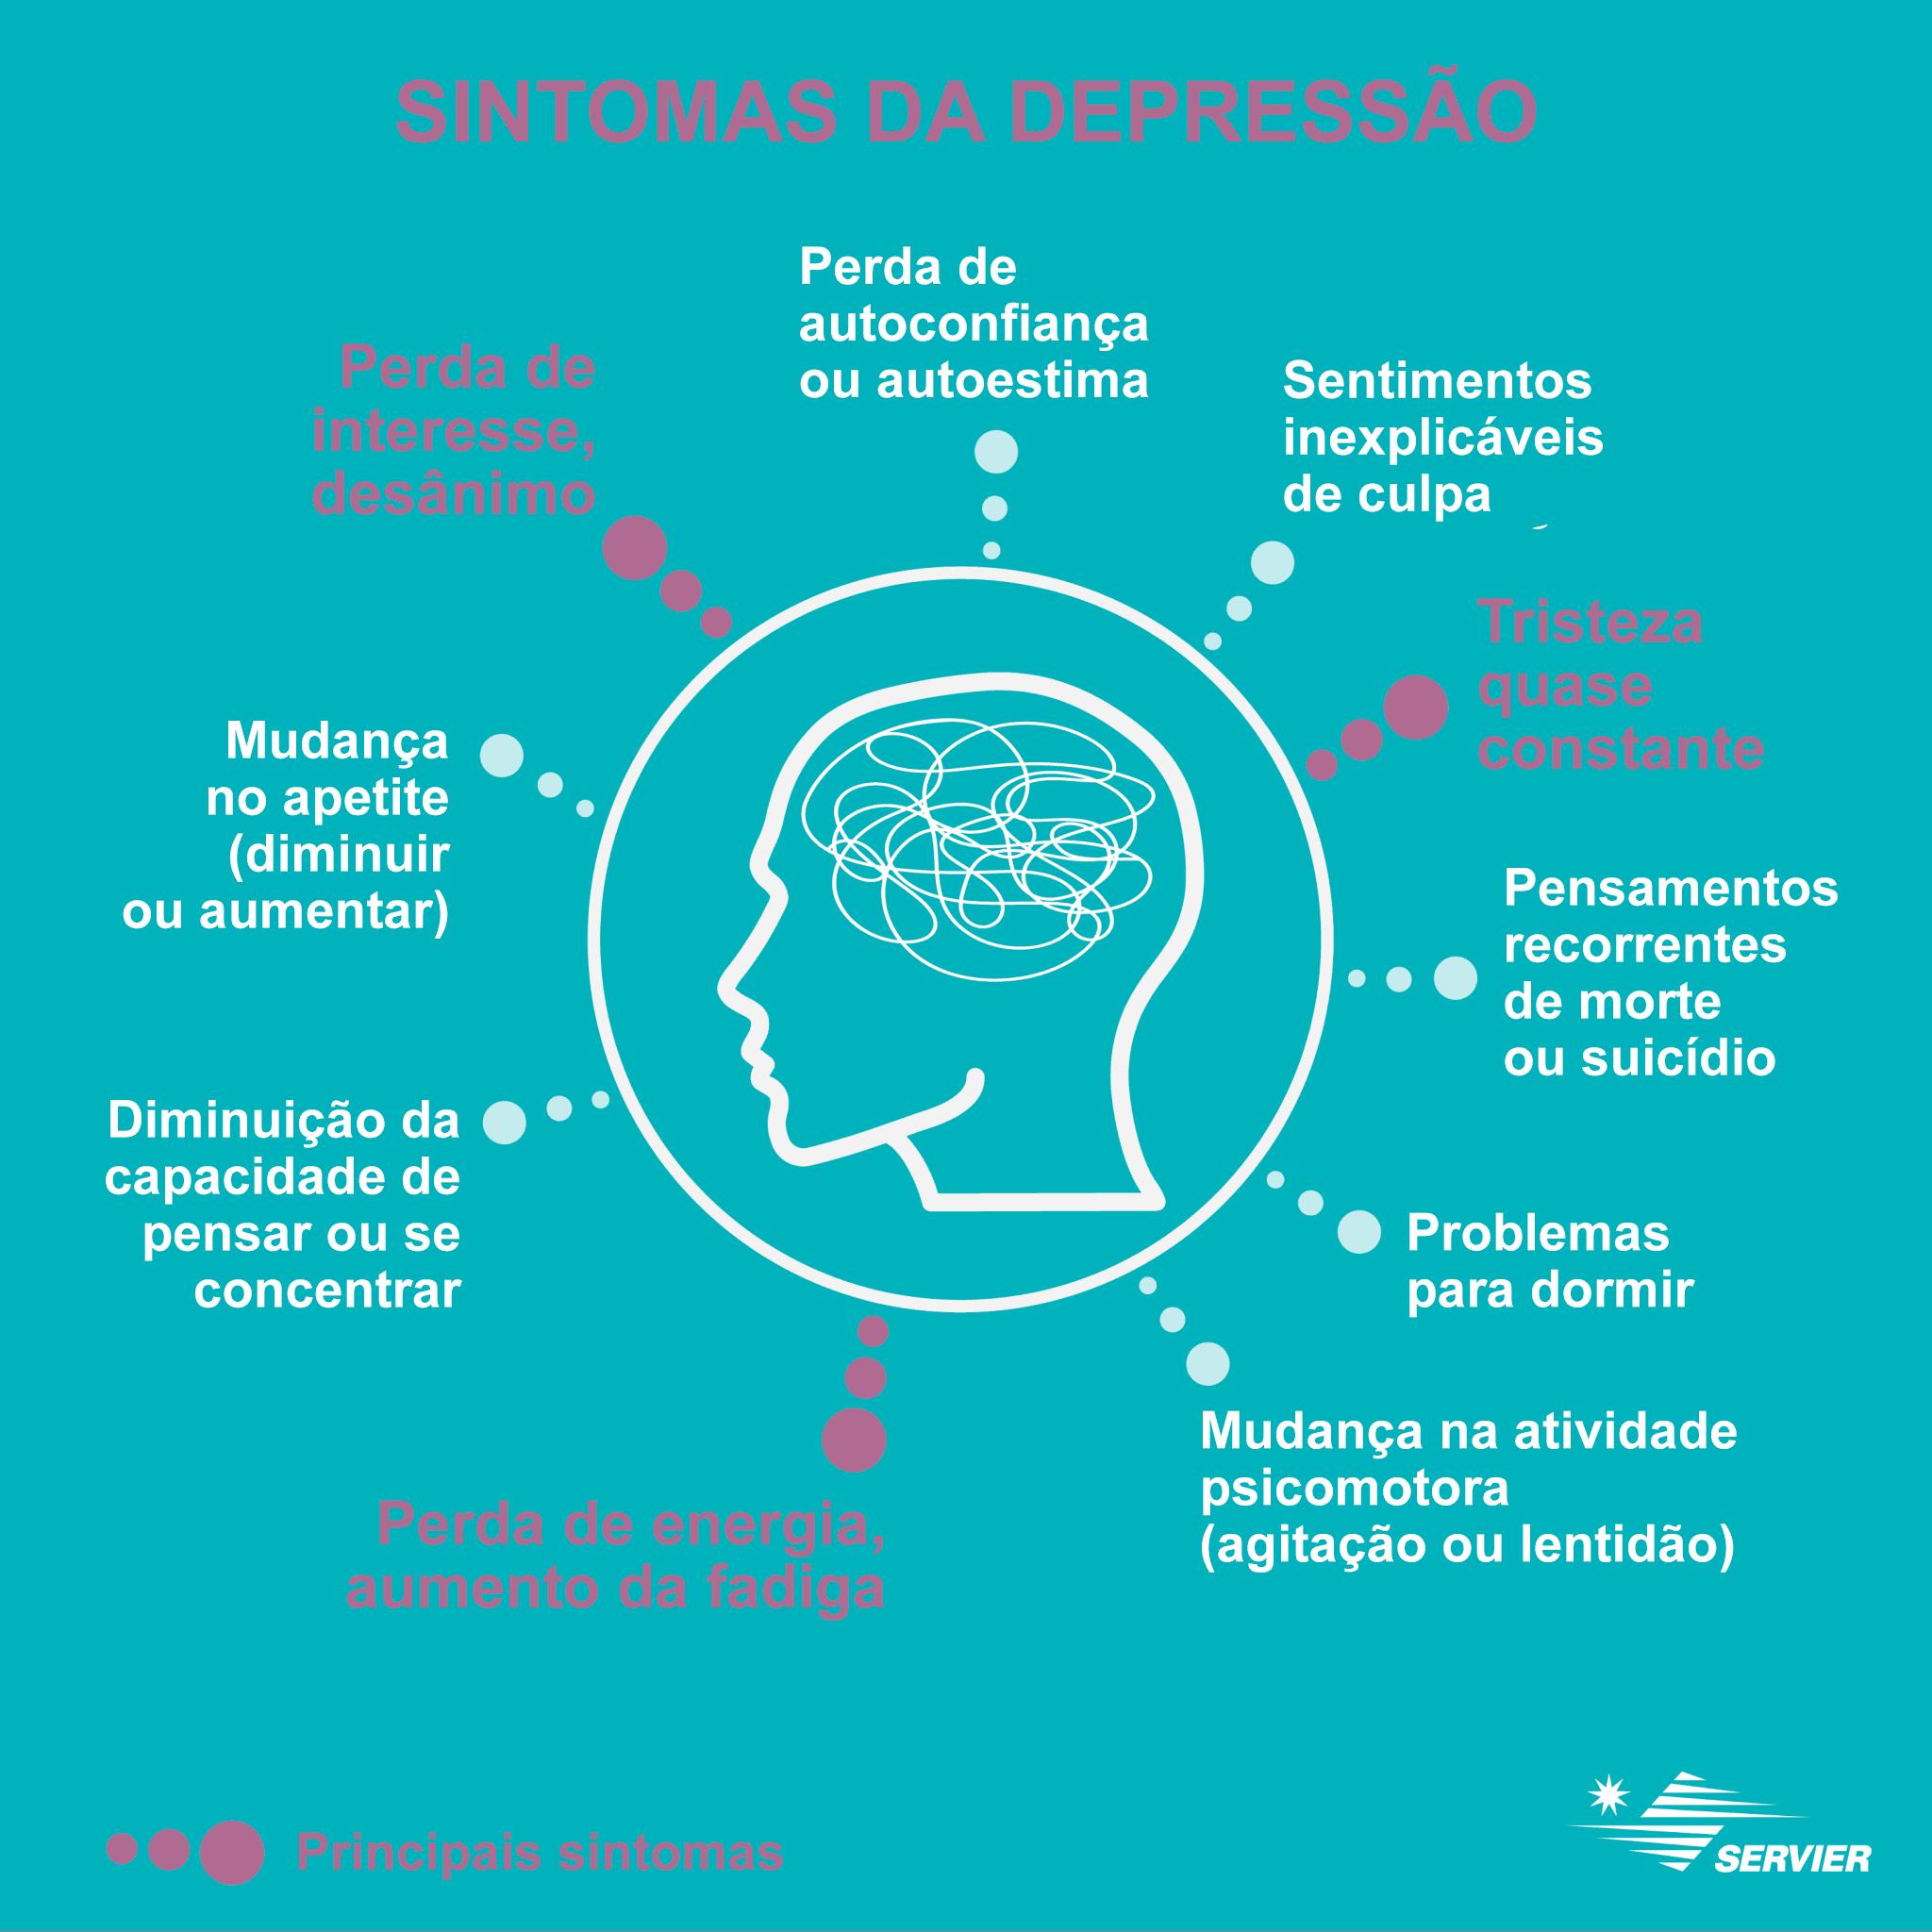 Post depressão